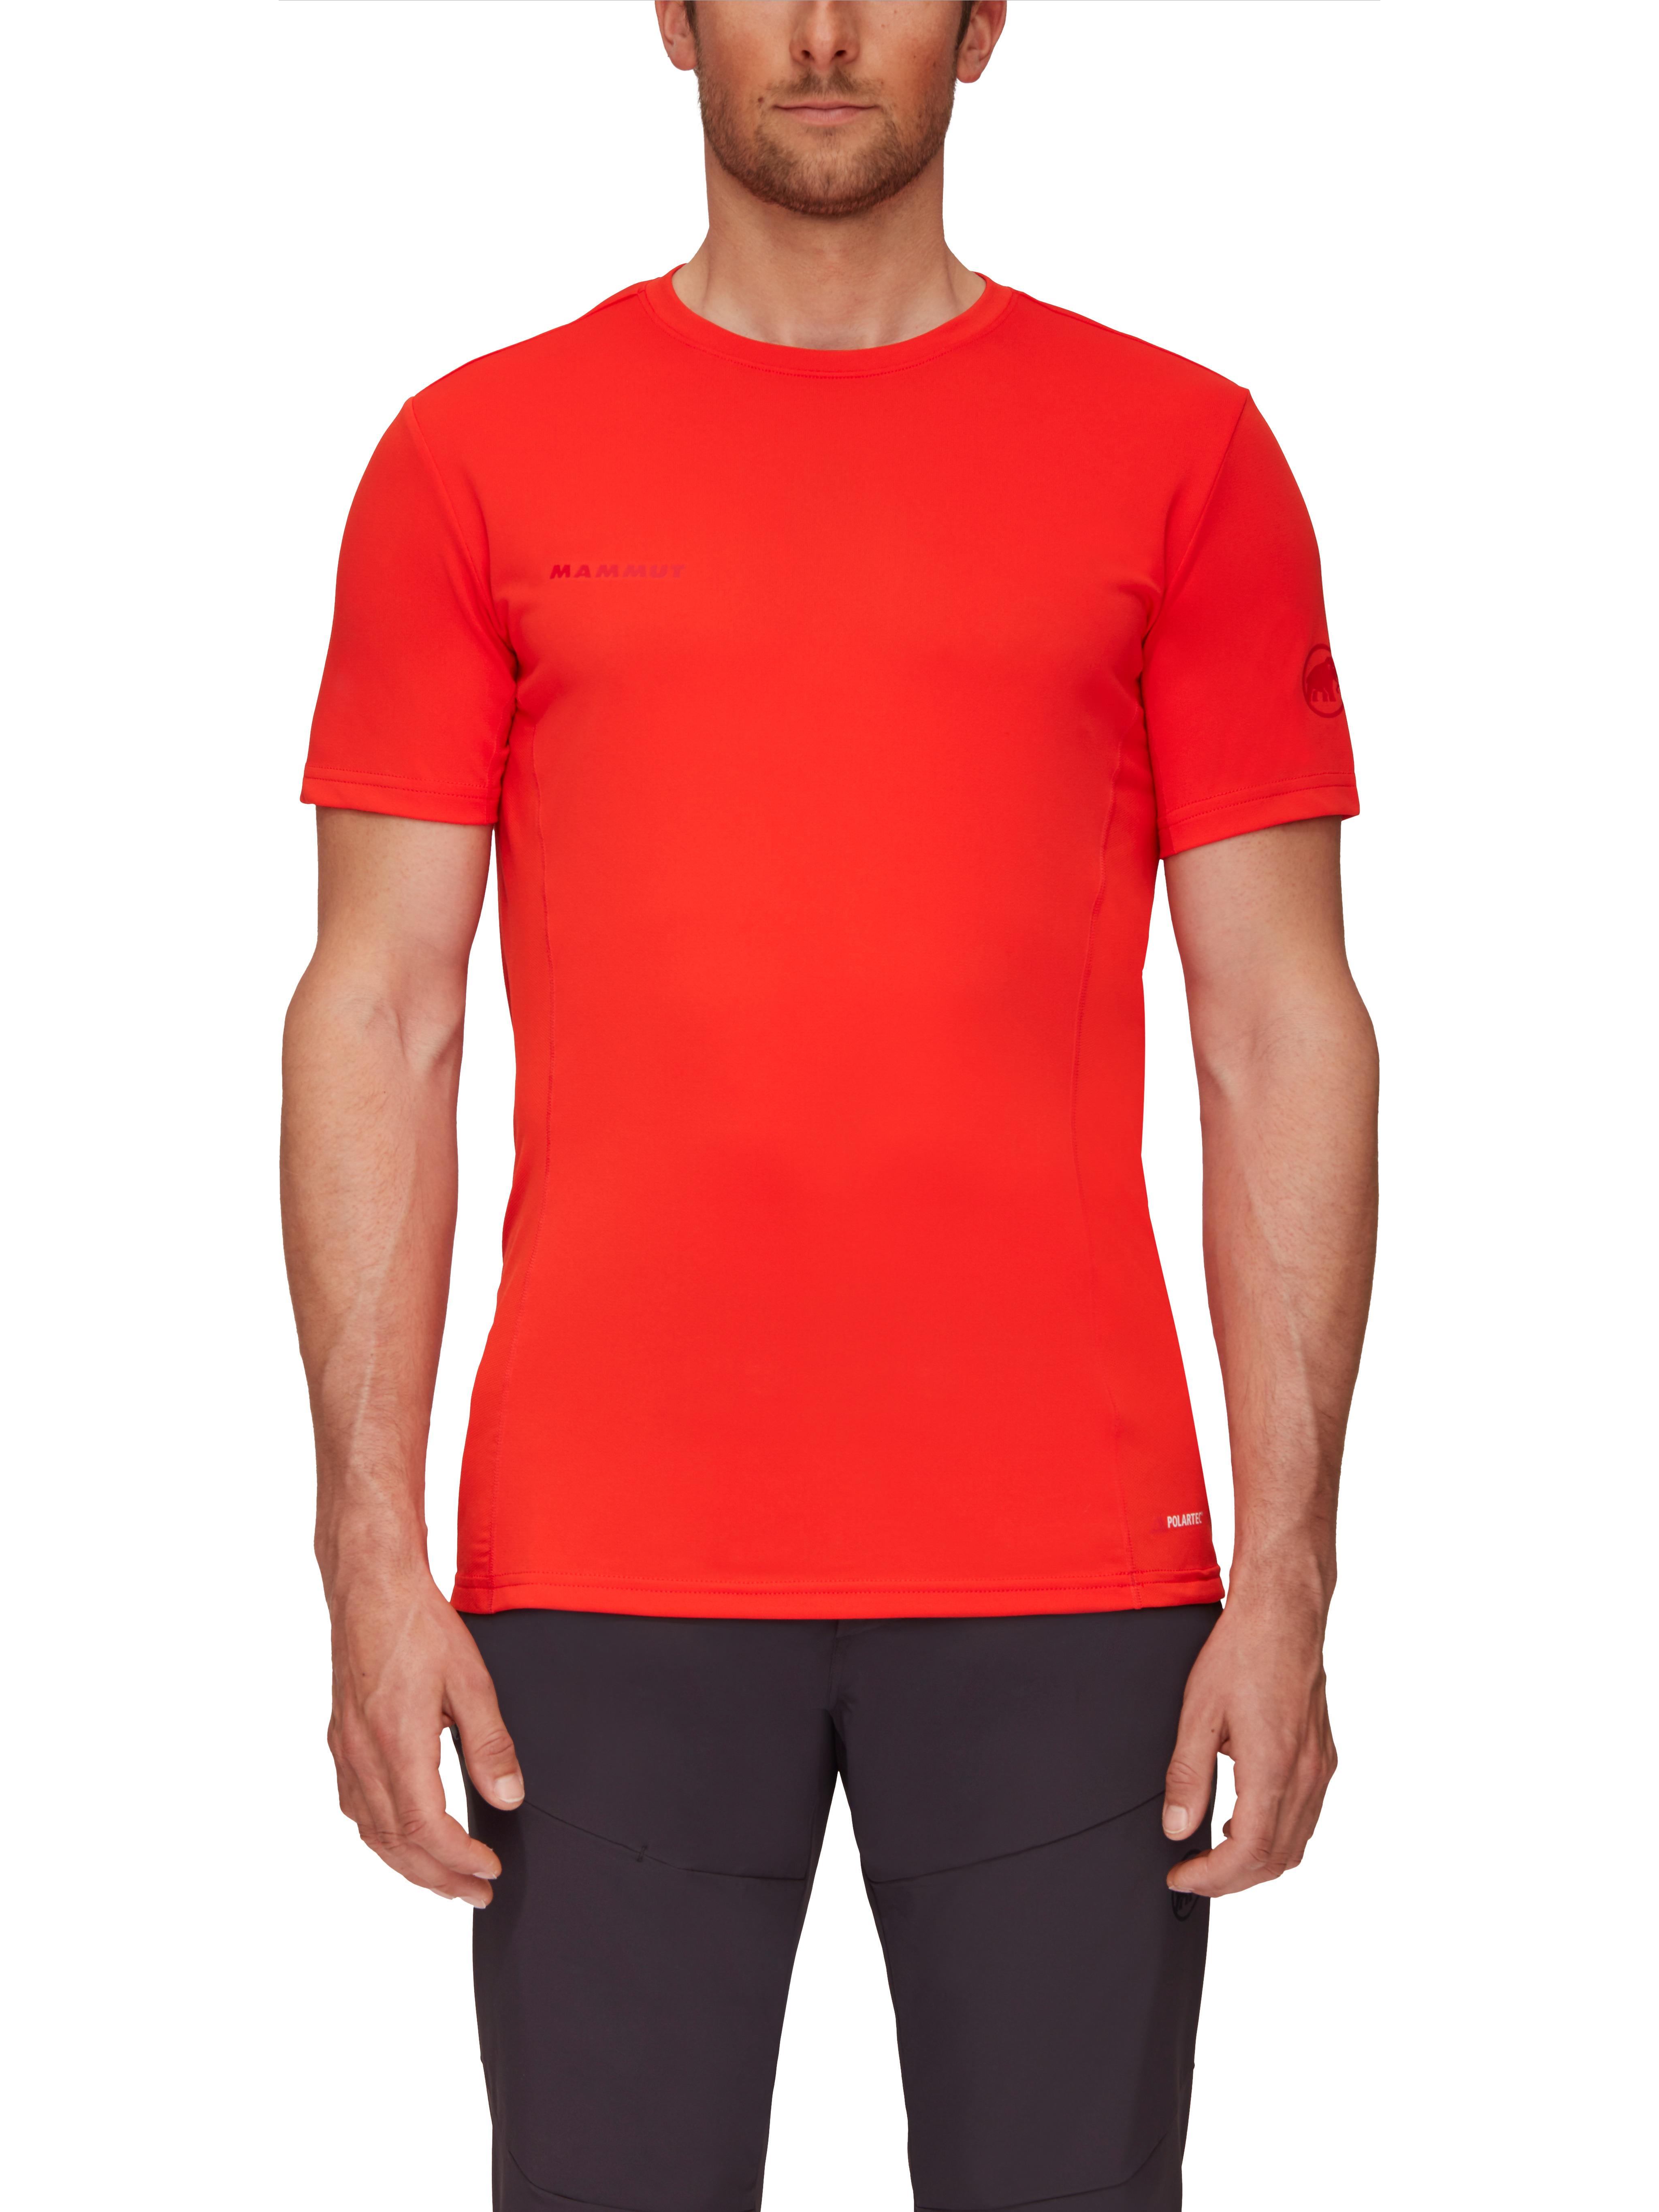 Sertig T-Shirt Men product image